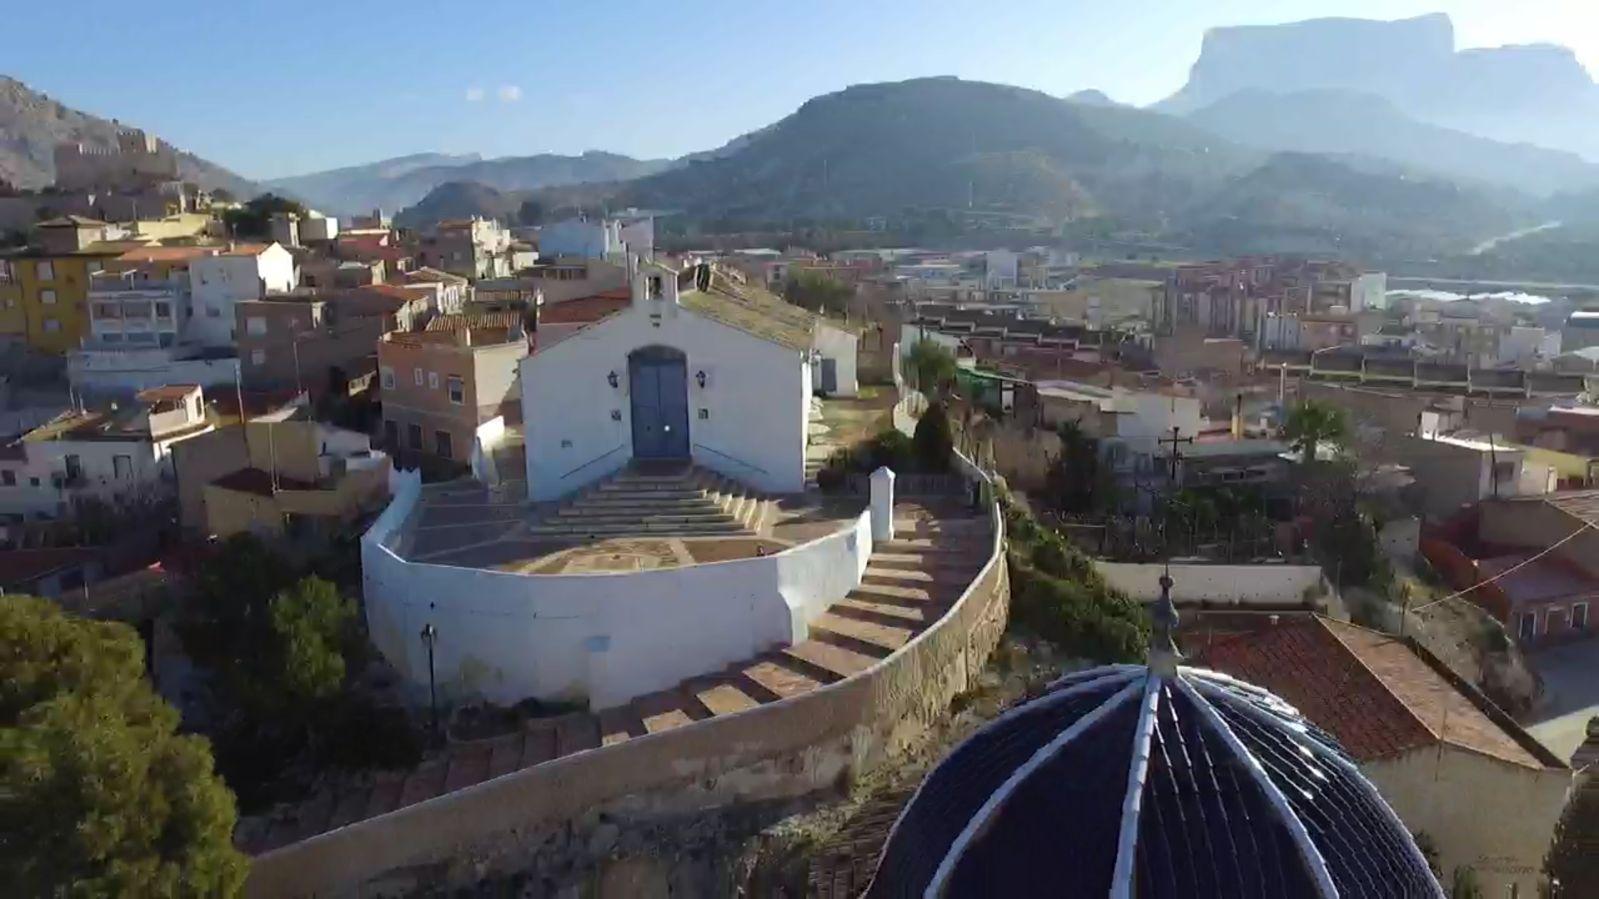 Ermita del Santísimo Cristo del Monte Calvario